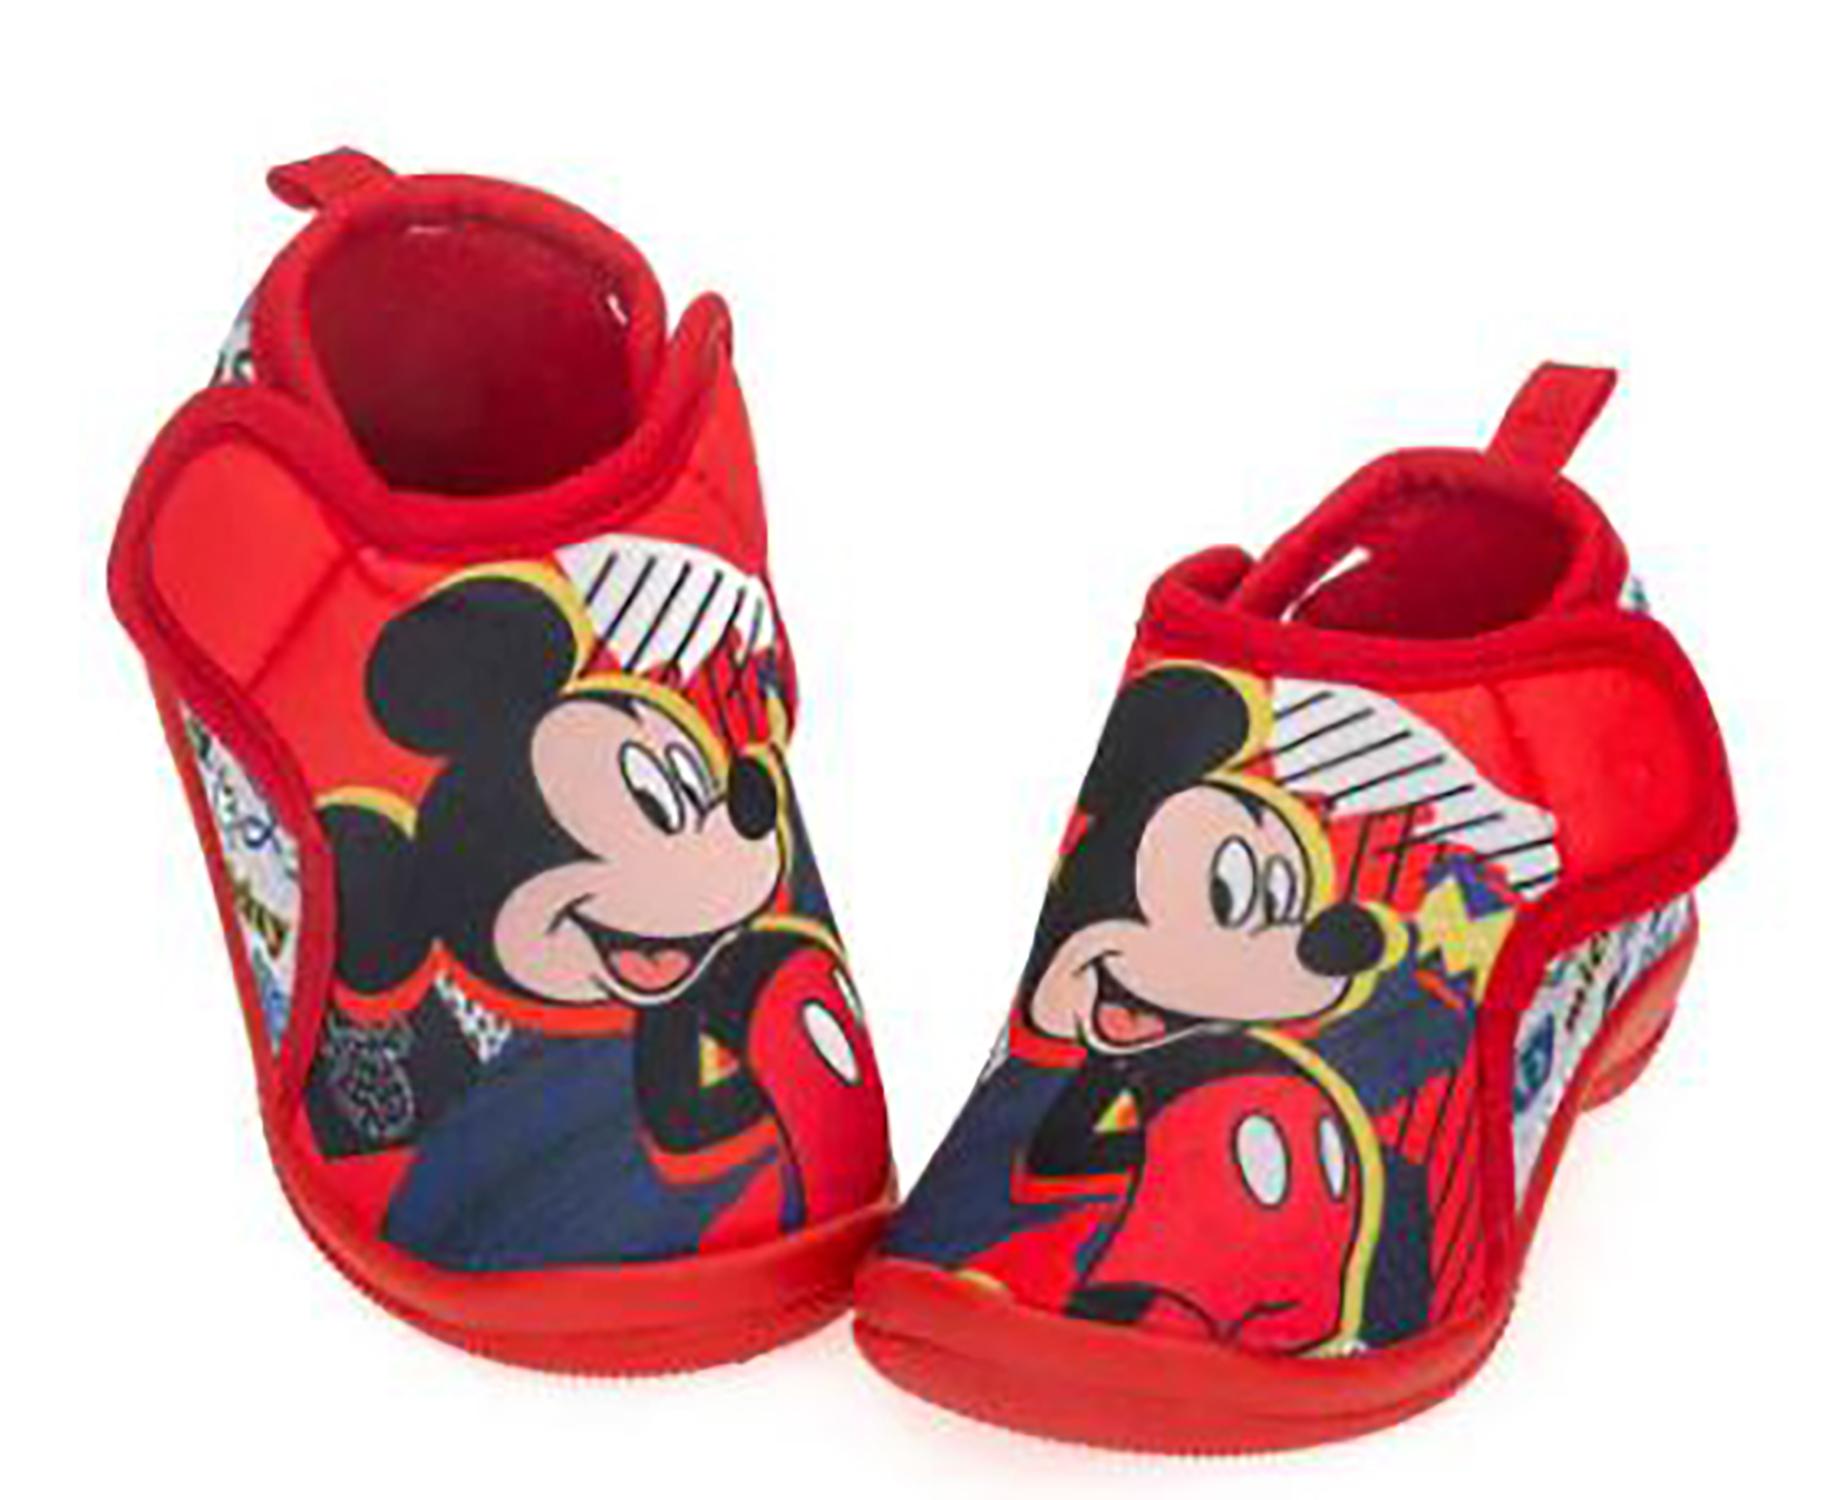 Pantofole Topolino chiuse dal 20 al 27 scarpine asilo